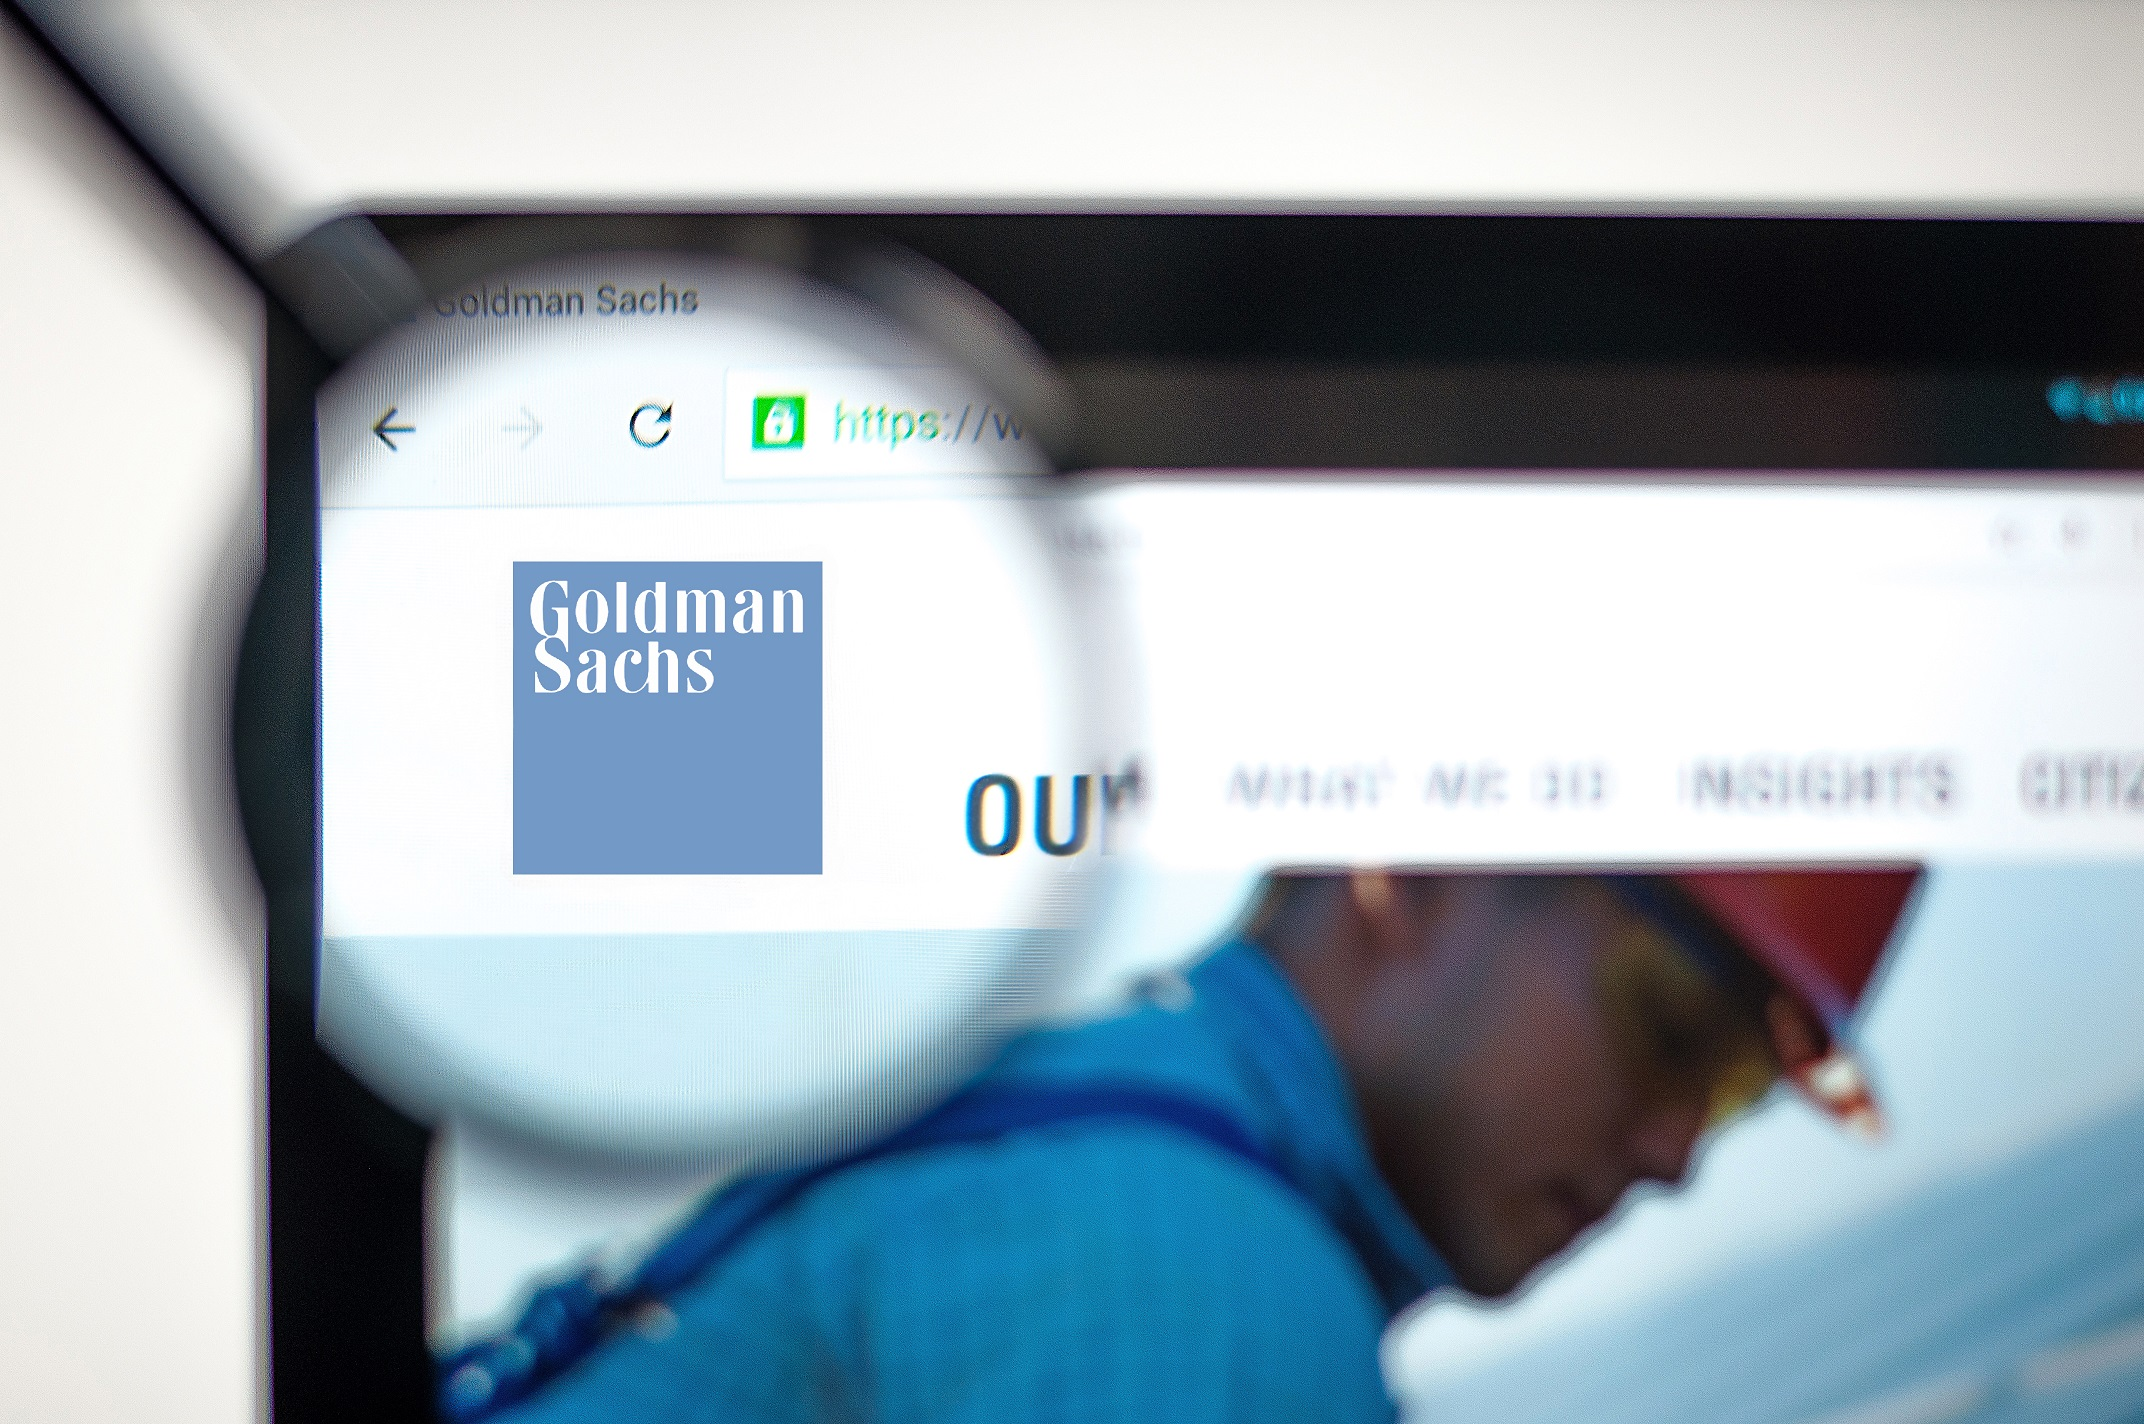 Goldman Sachs website